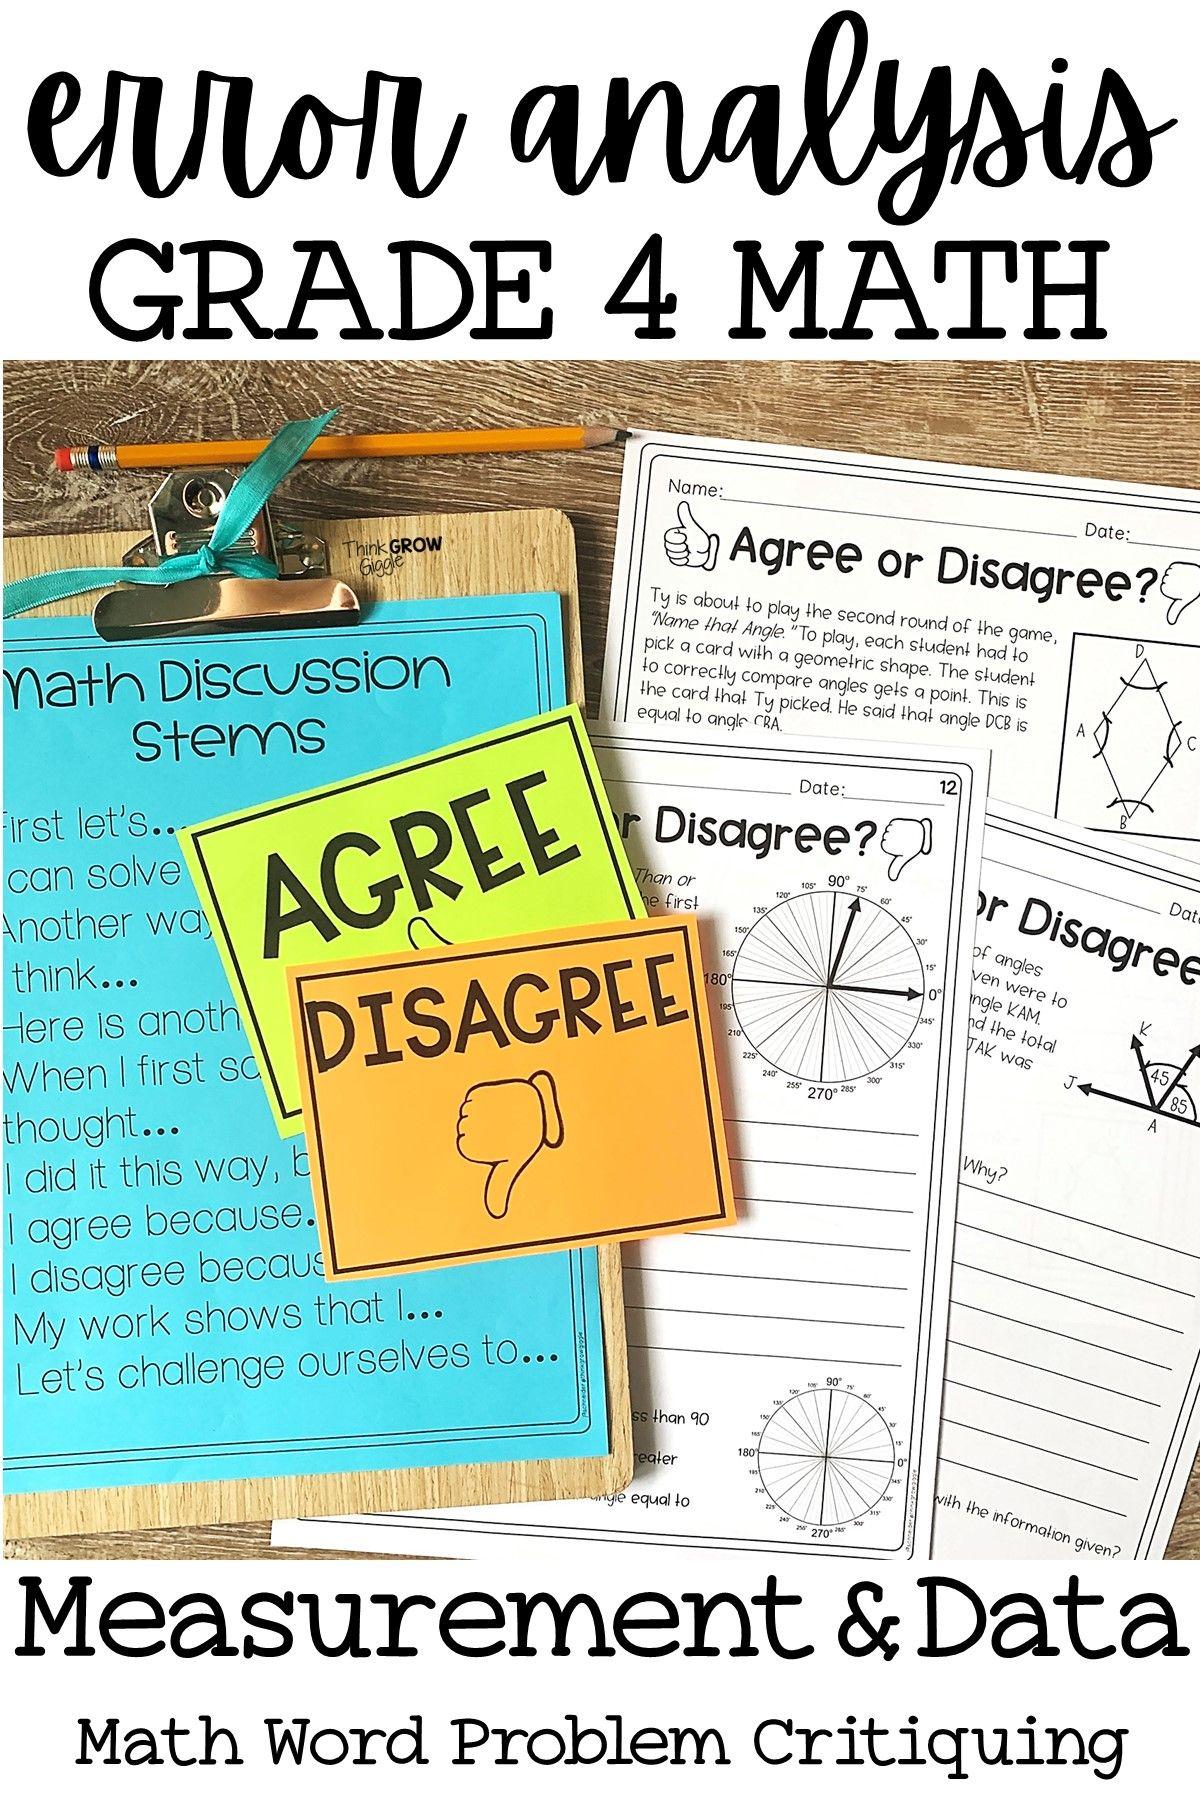 Errorysis Math Grade 4